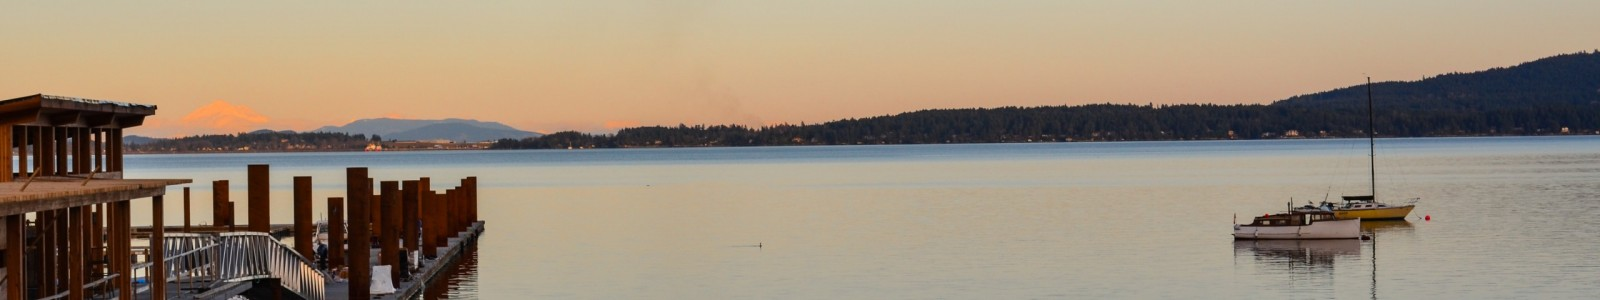 shawnigan lake real estate vancouver island dfh